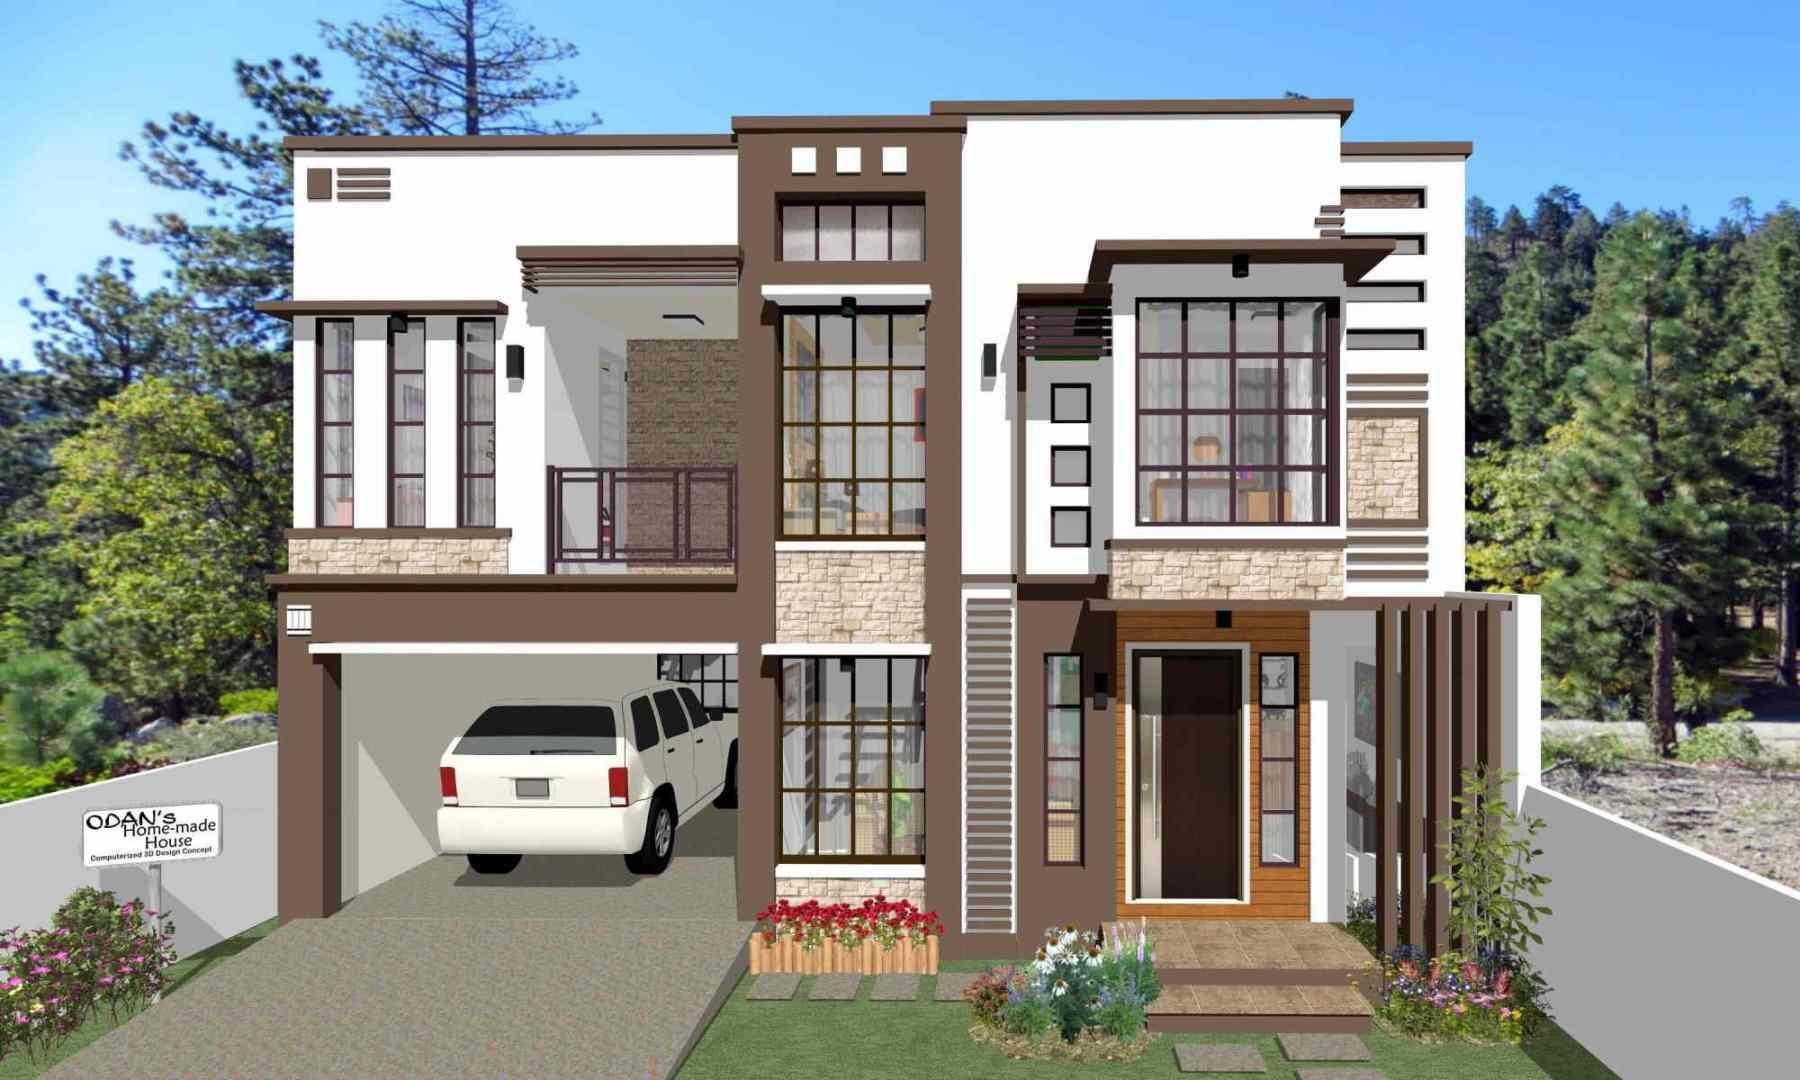 Rodante Bernabe's 1st Place Remodel / Addition Design